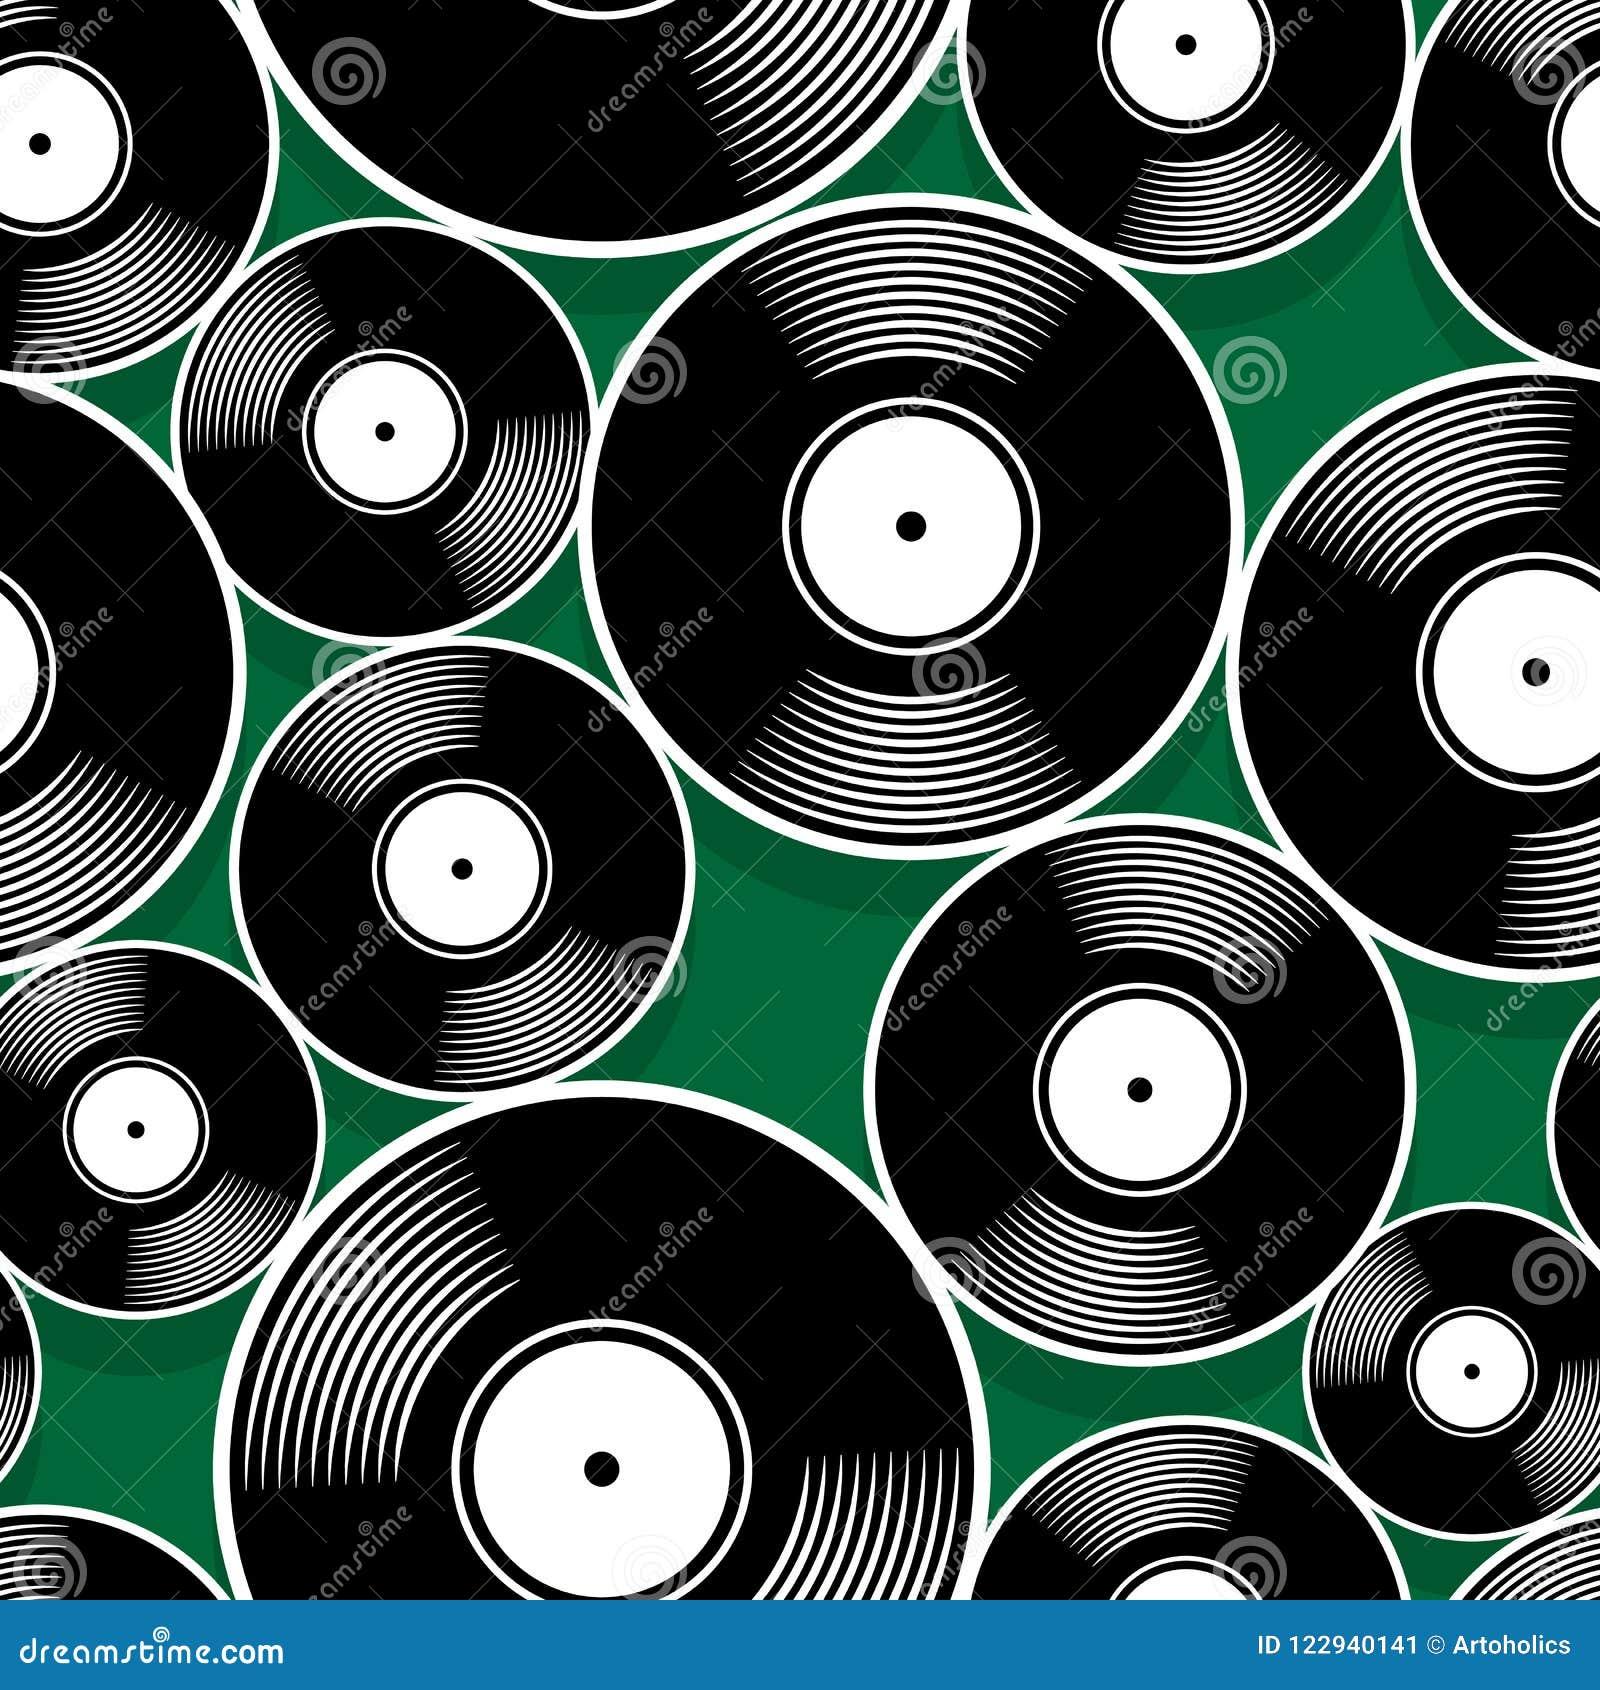 Seamless Digital Pattern With Retro Vintage Vinyl Record Vector